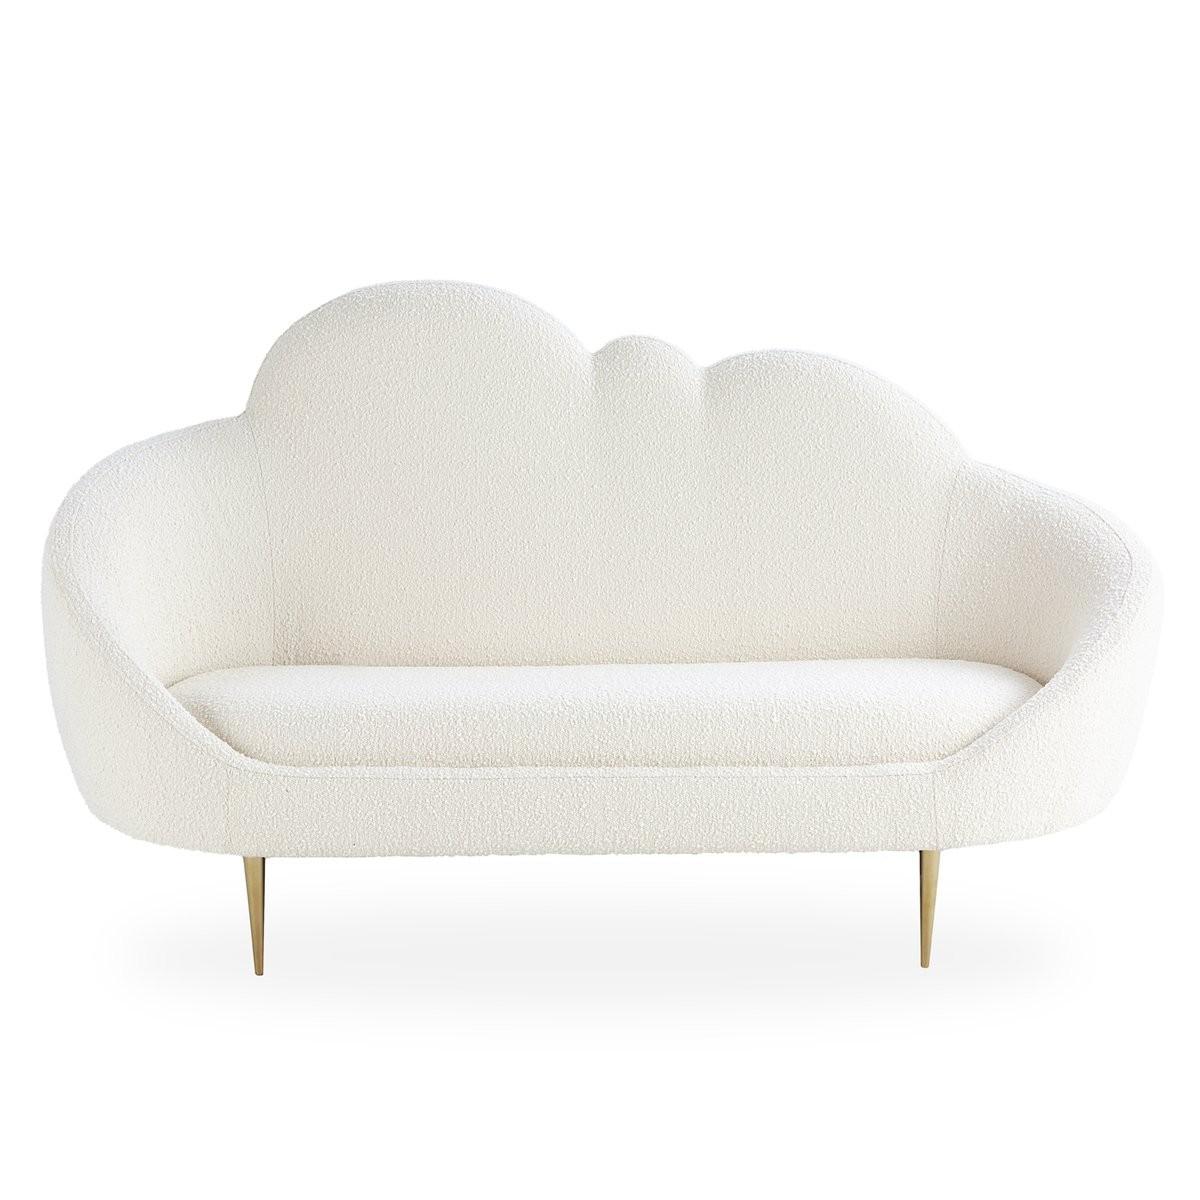 Jonathan Adler I Ether Cloud Settee